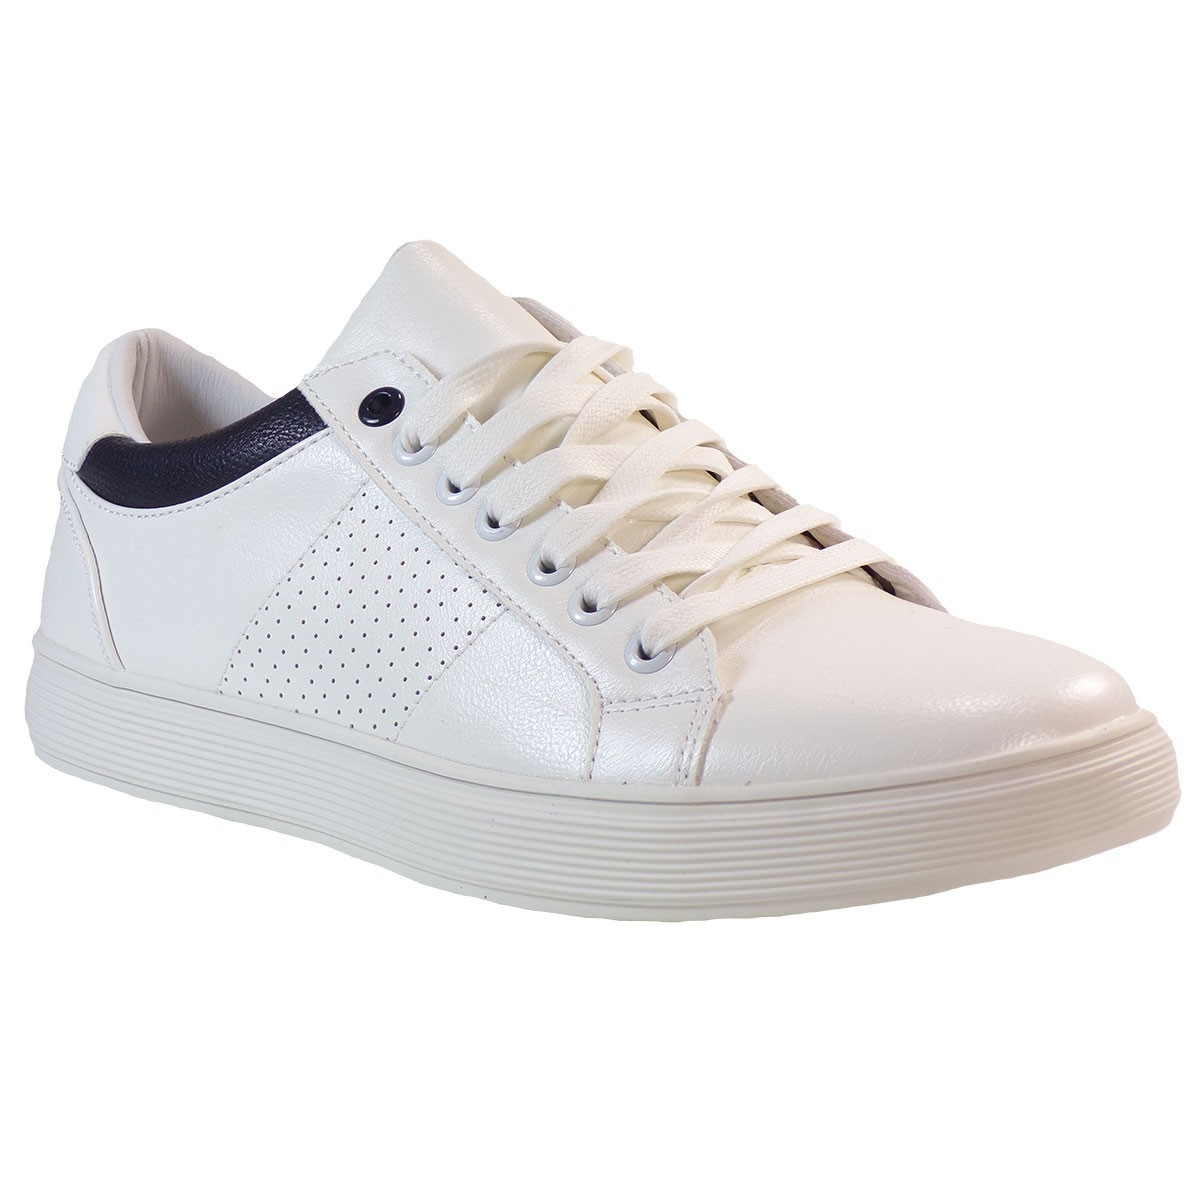 JK LONDON Ανδρικά παπούτσια Sneakers Y7170-13 Λευκό I57002181174